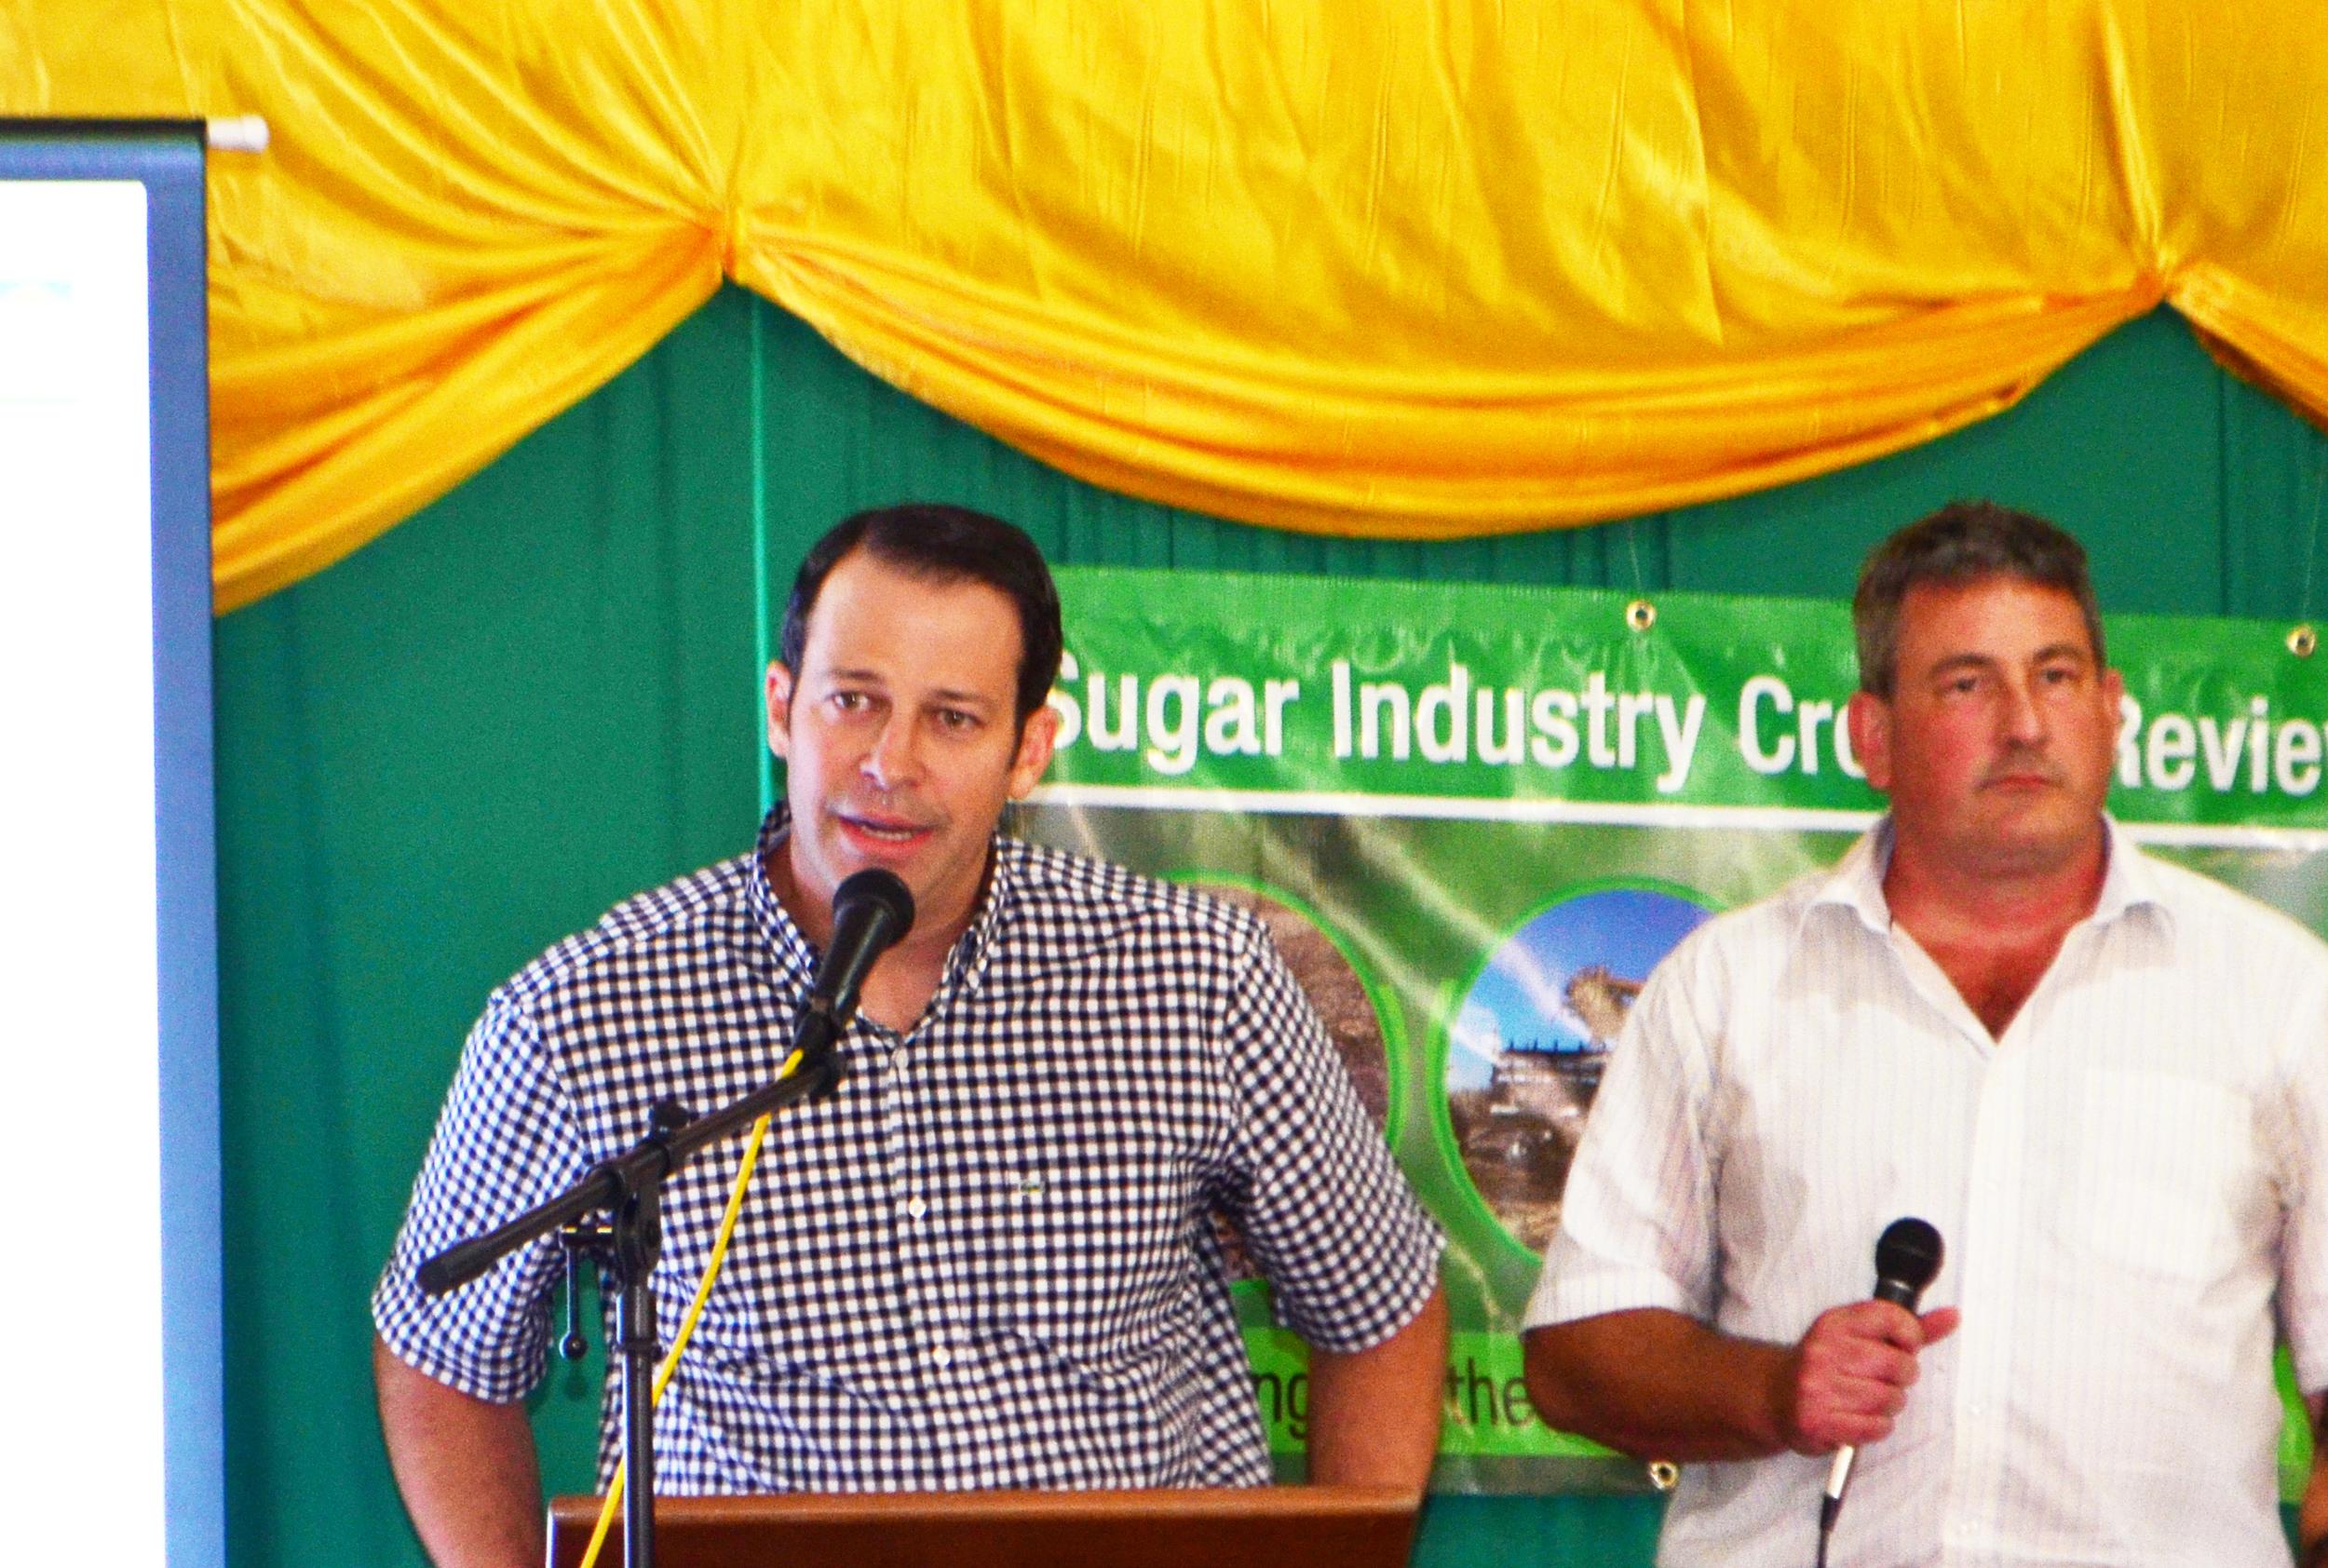 Celestino Ruiz, ASR's Vice President & Mac McLachlan, Vice President of International Relations